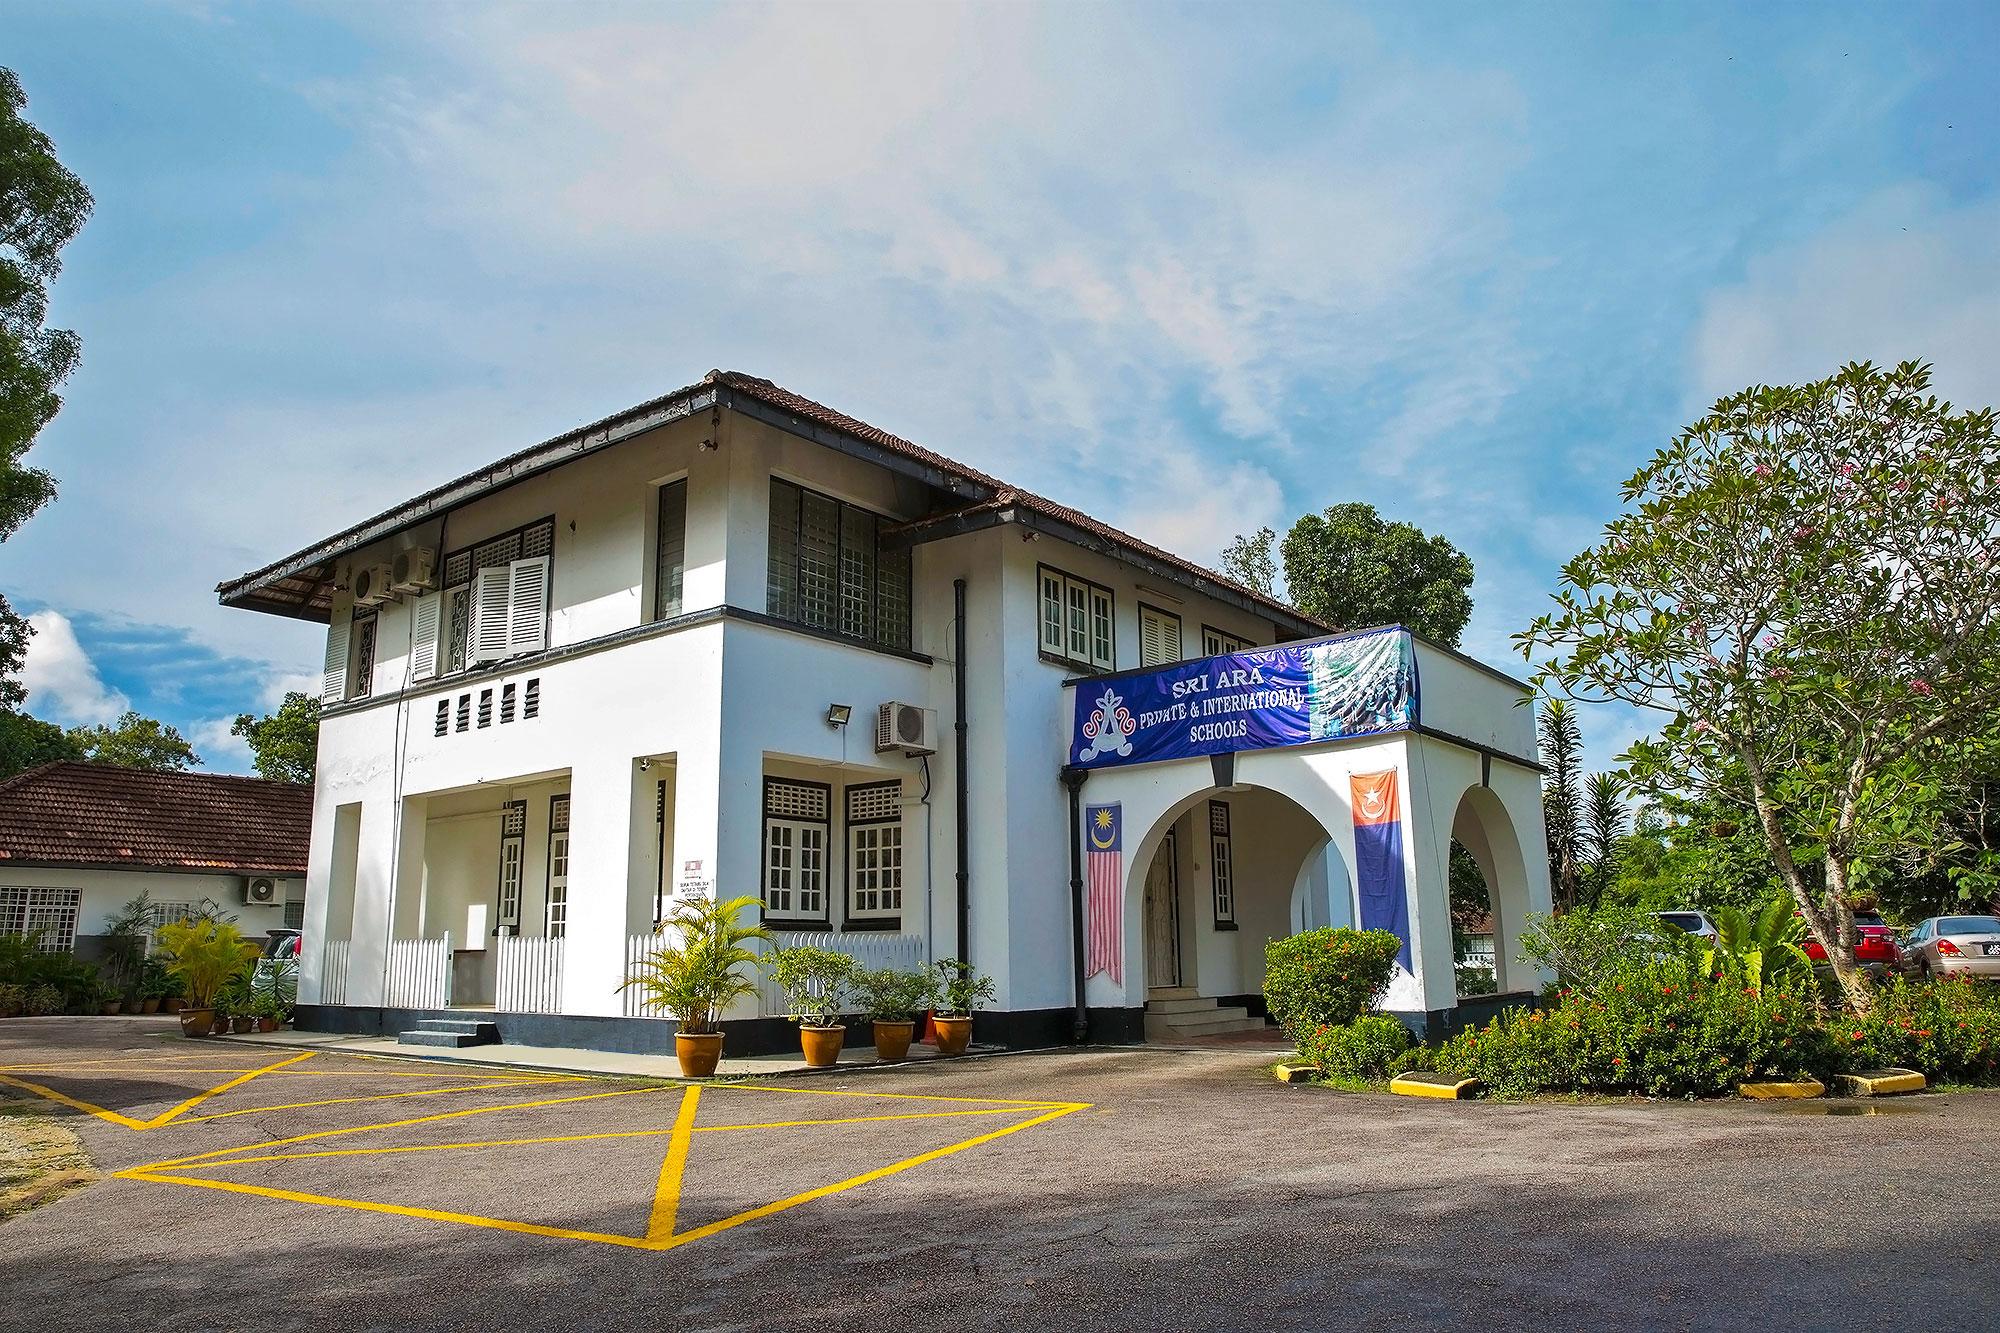 Sri Ara International School